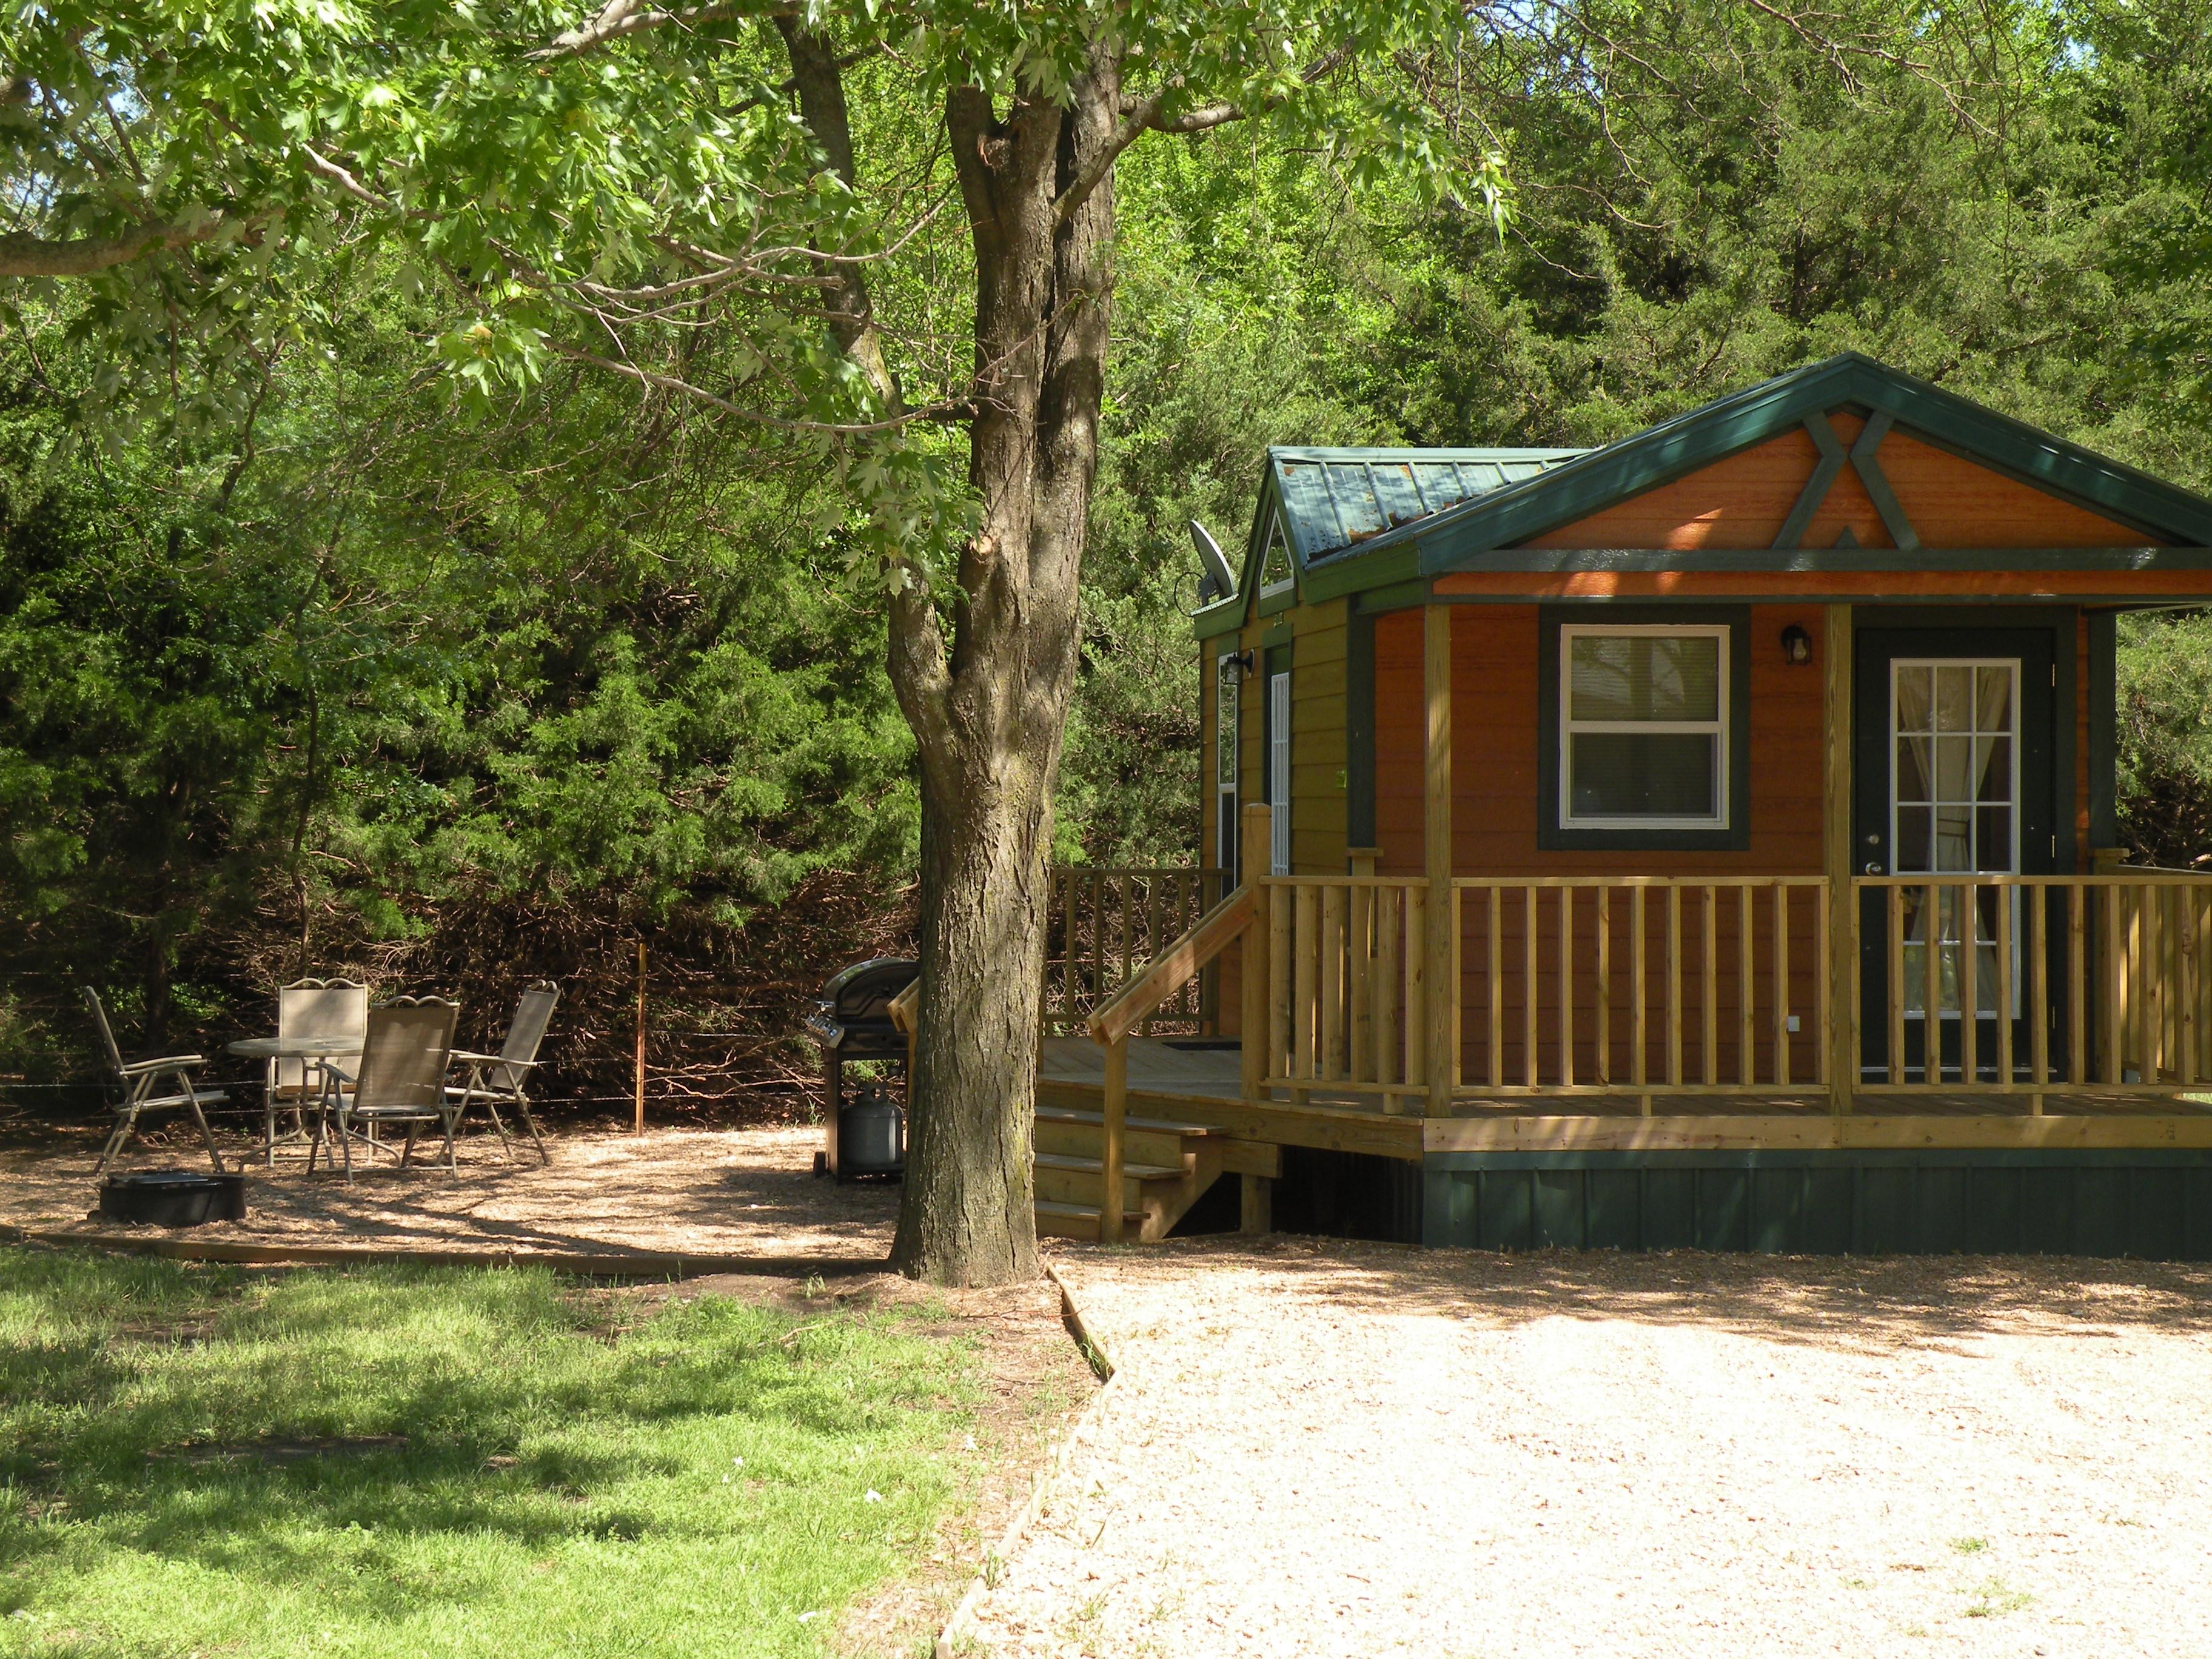 kansas campground campgrounds wellington koa in cabins cabin rentals